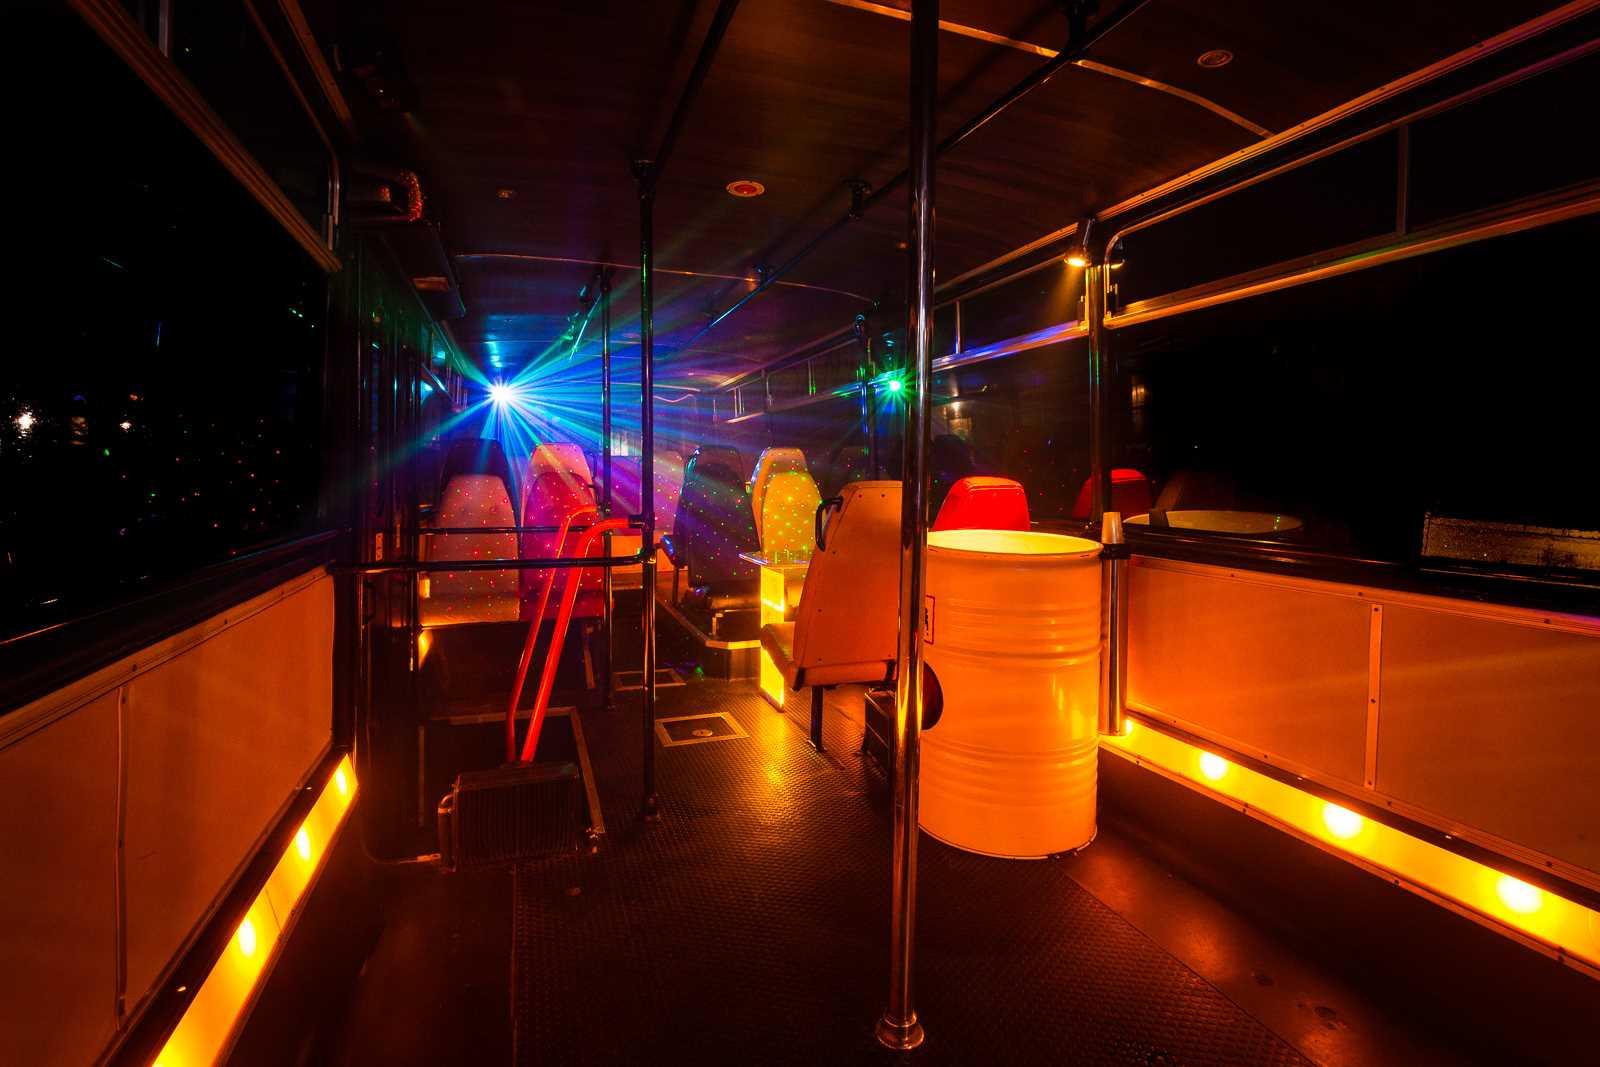 Partybus Flughafentransfer Budapest  Pissup Reisen